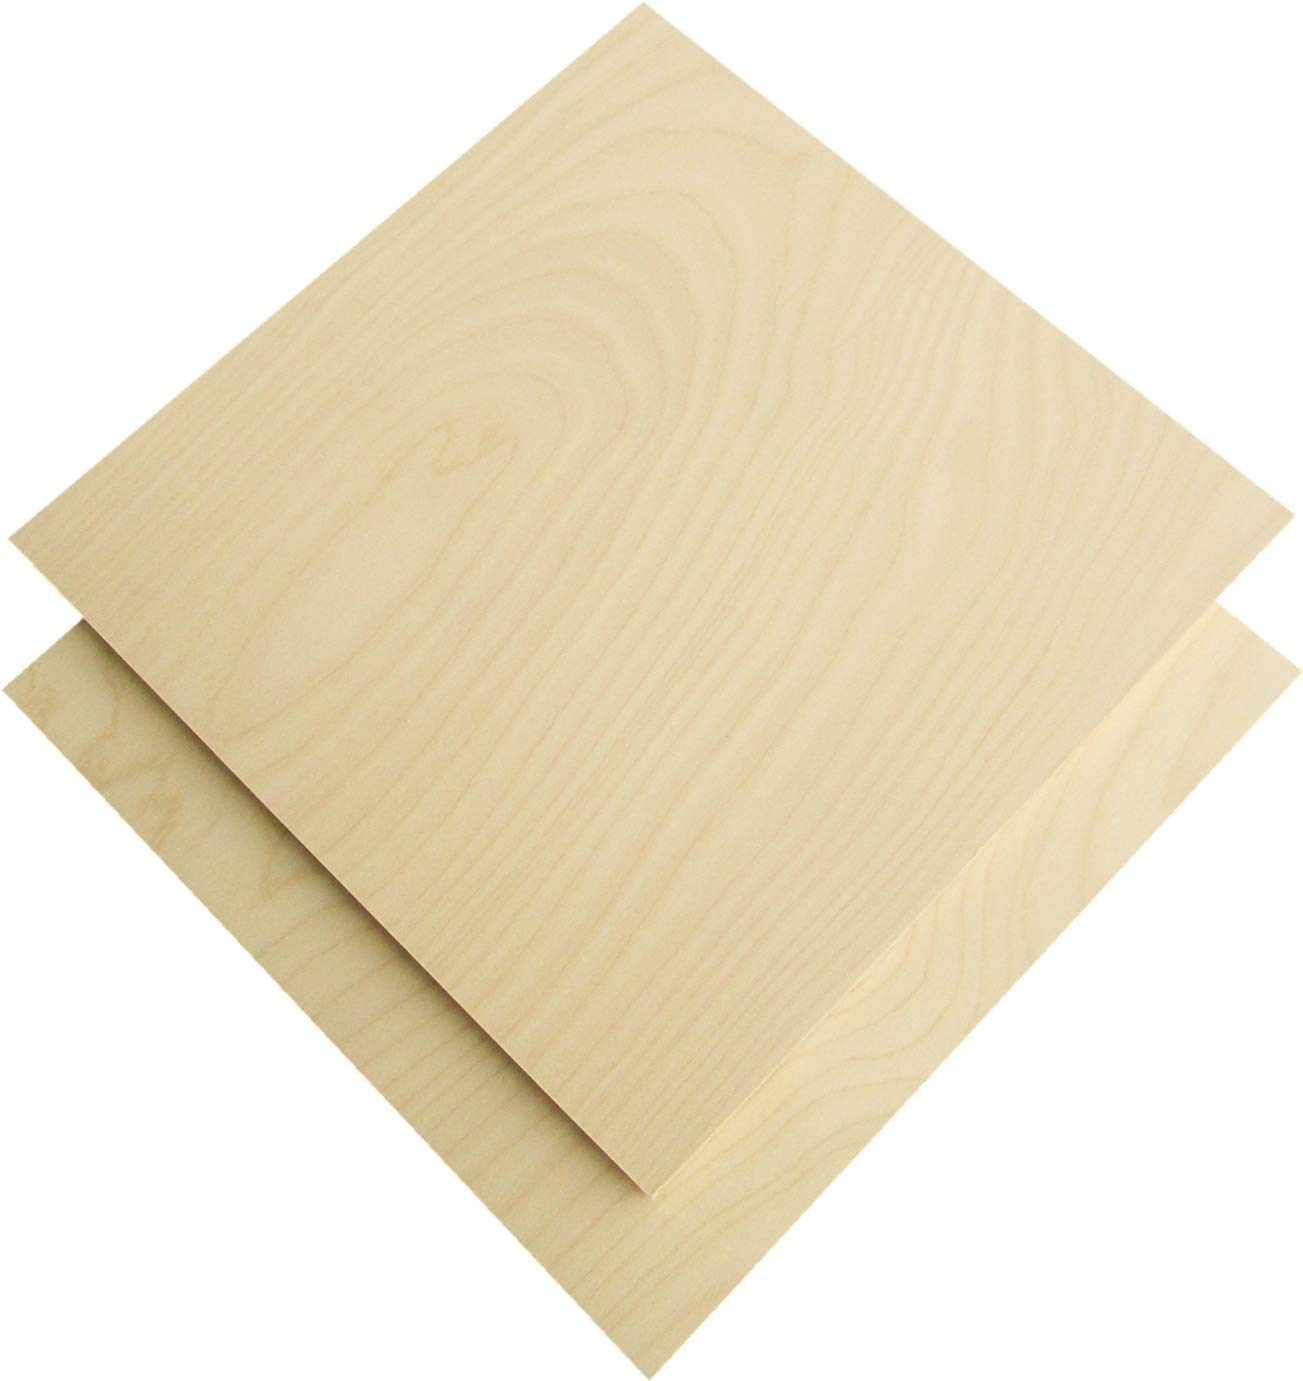 9 mm 1/3''x 10''x 10'' Russian Birch Plywood B/BB Grade 4 Flat Sheets by Hoito wood